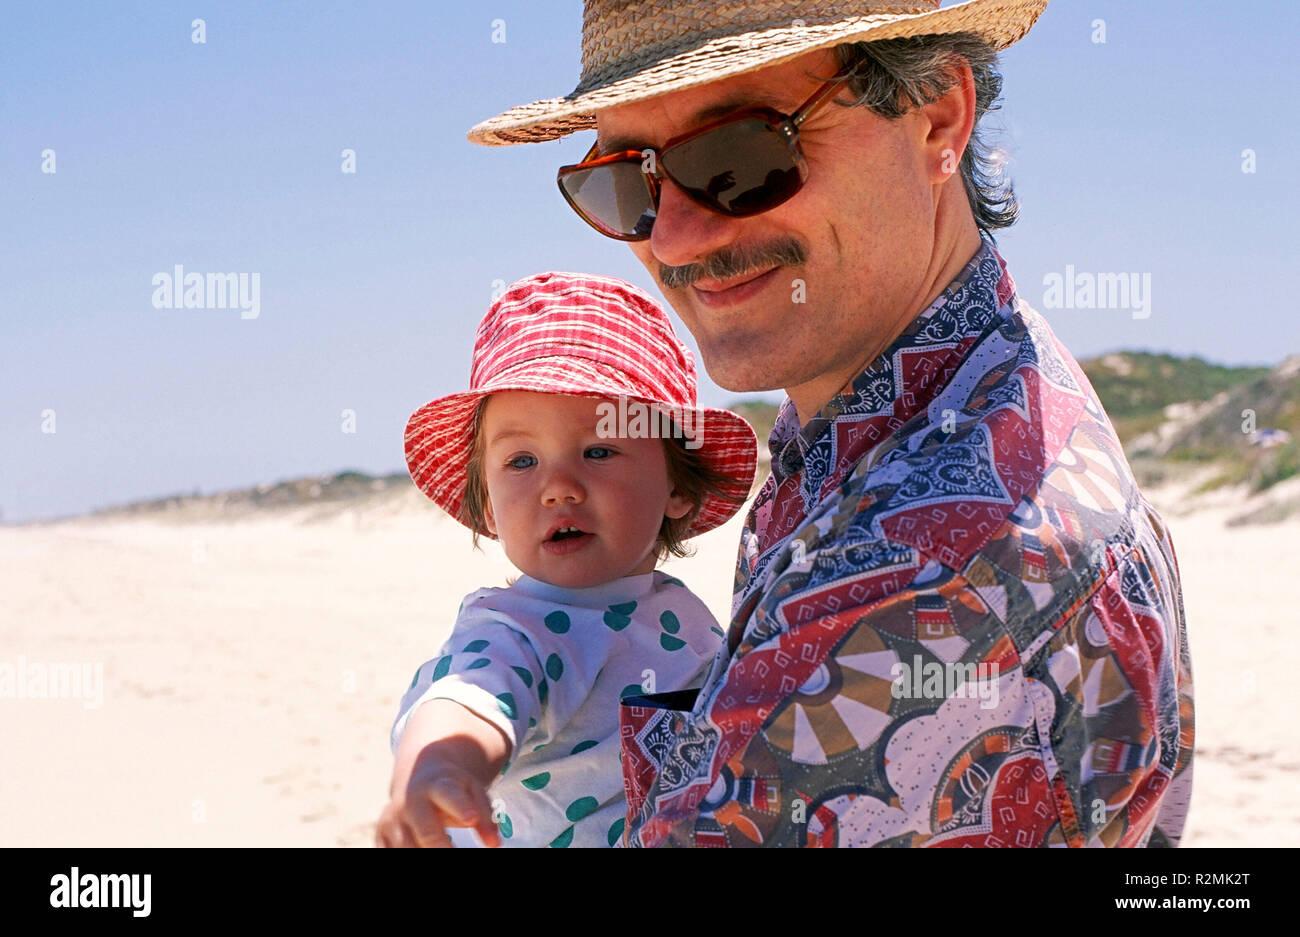 Series, Child, Growing up, Development, Generation, Future Stock Photo